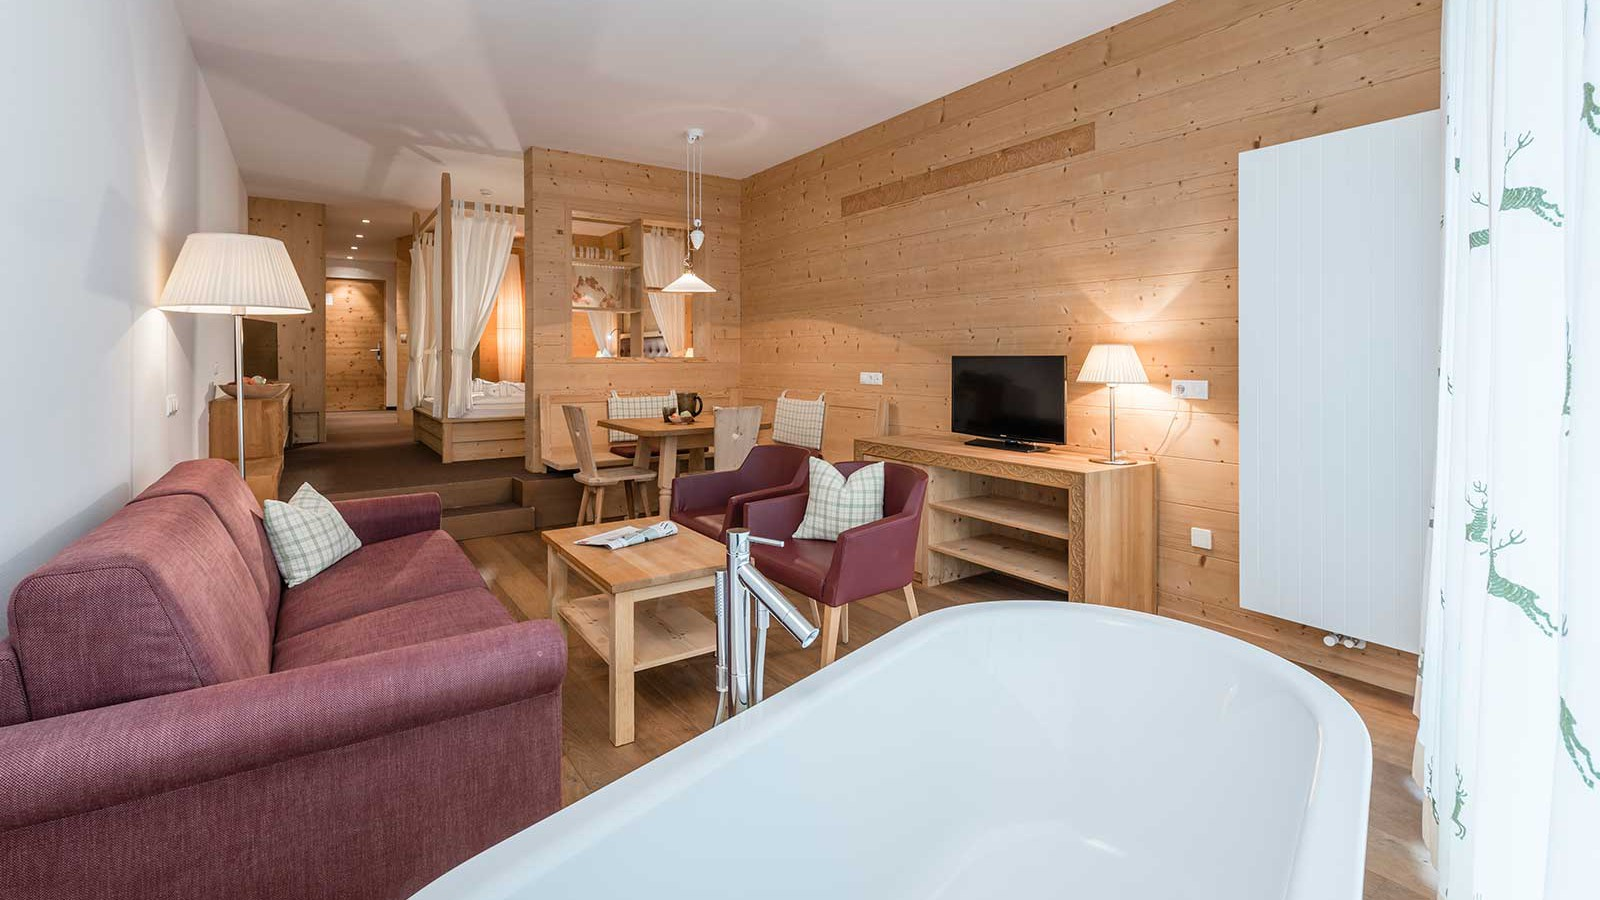 Alpenheim Charming Hotel - wellness suite - 4